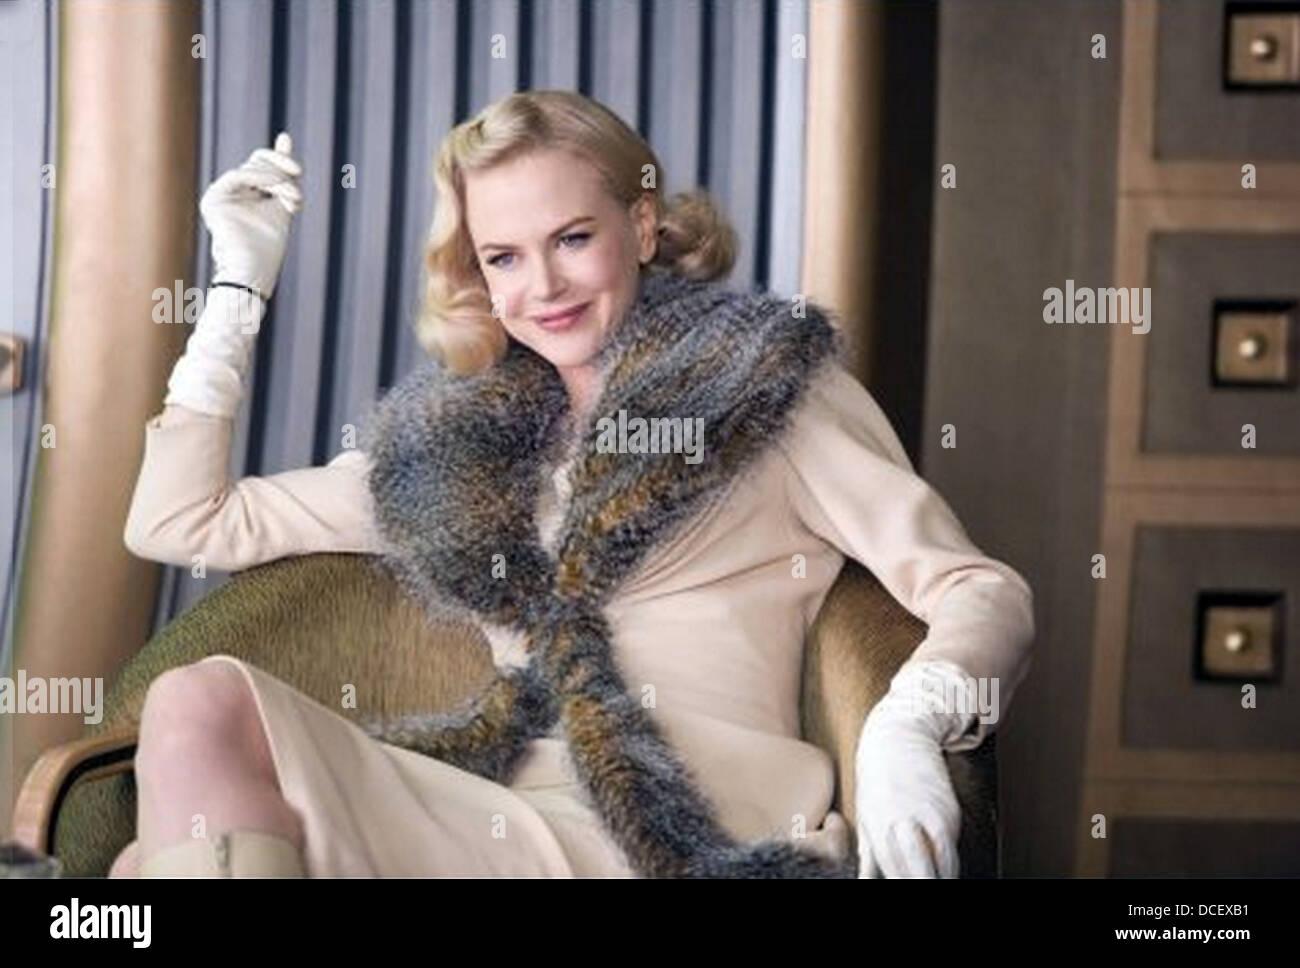 THE GOLDEN COMPASS 2007 Metropolitan Films movie with Nicole Kidman - Stock Image